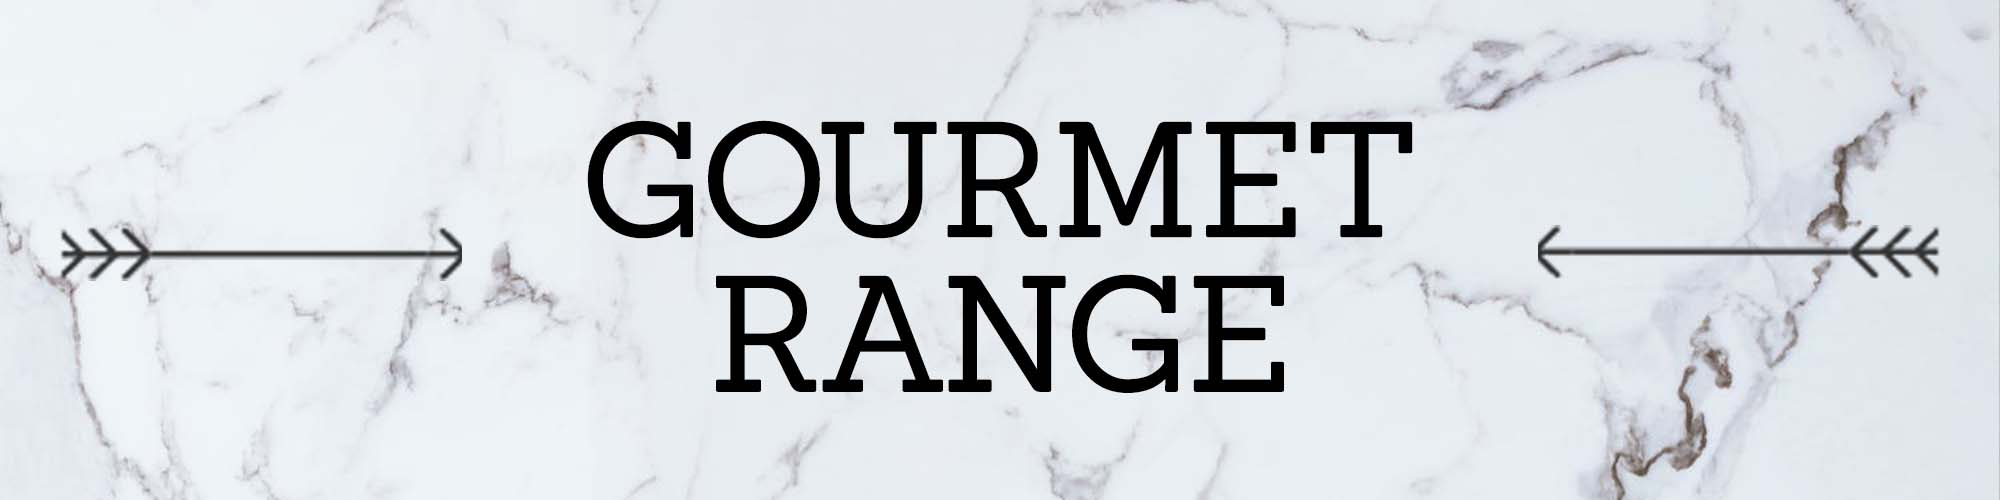 Gourmet Range